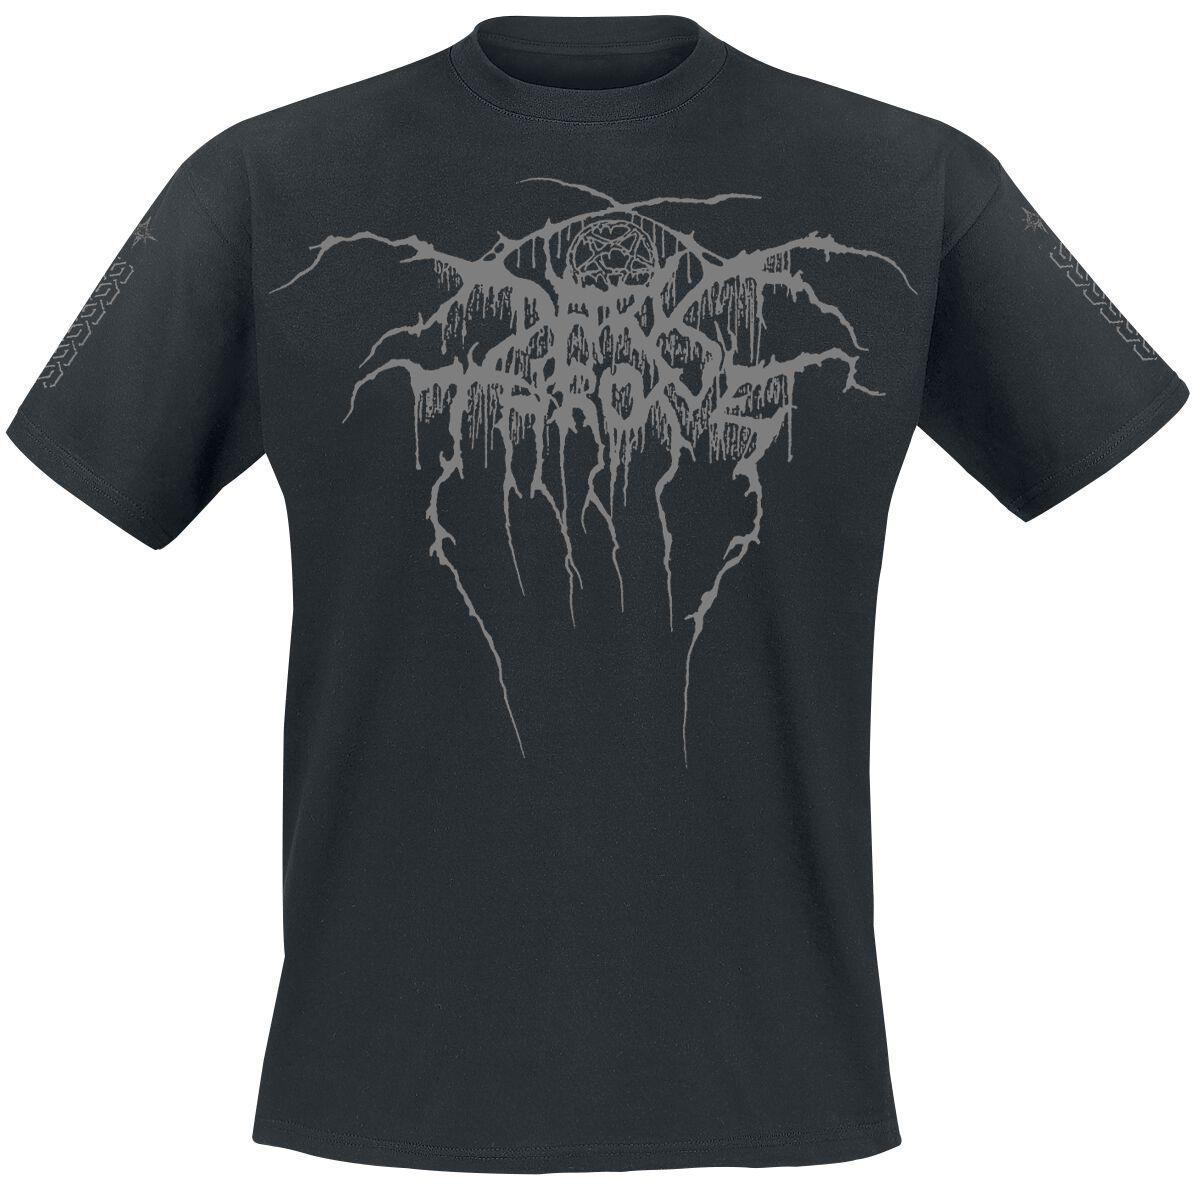 Zespoły - Koszulki - T-Shirt Darkthrone True Norwegian Black Metal T-Shirt czarny - 354146